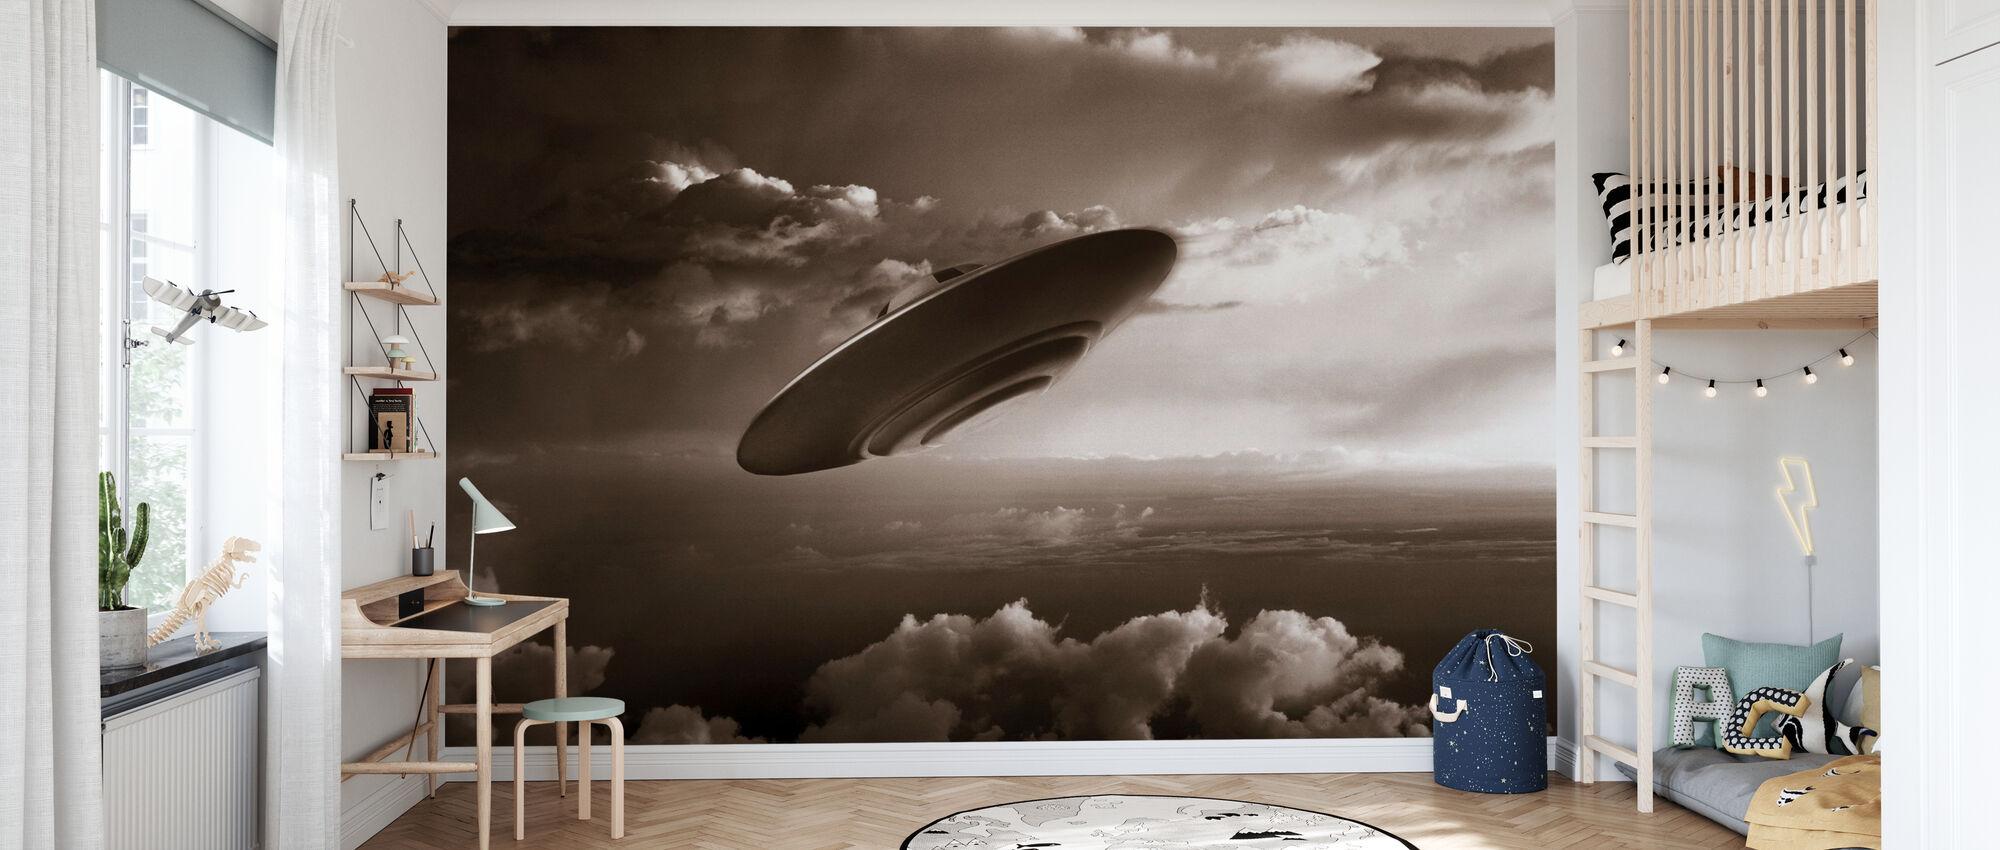 Ufo - Sepia - Wallpaper - Kids Room